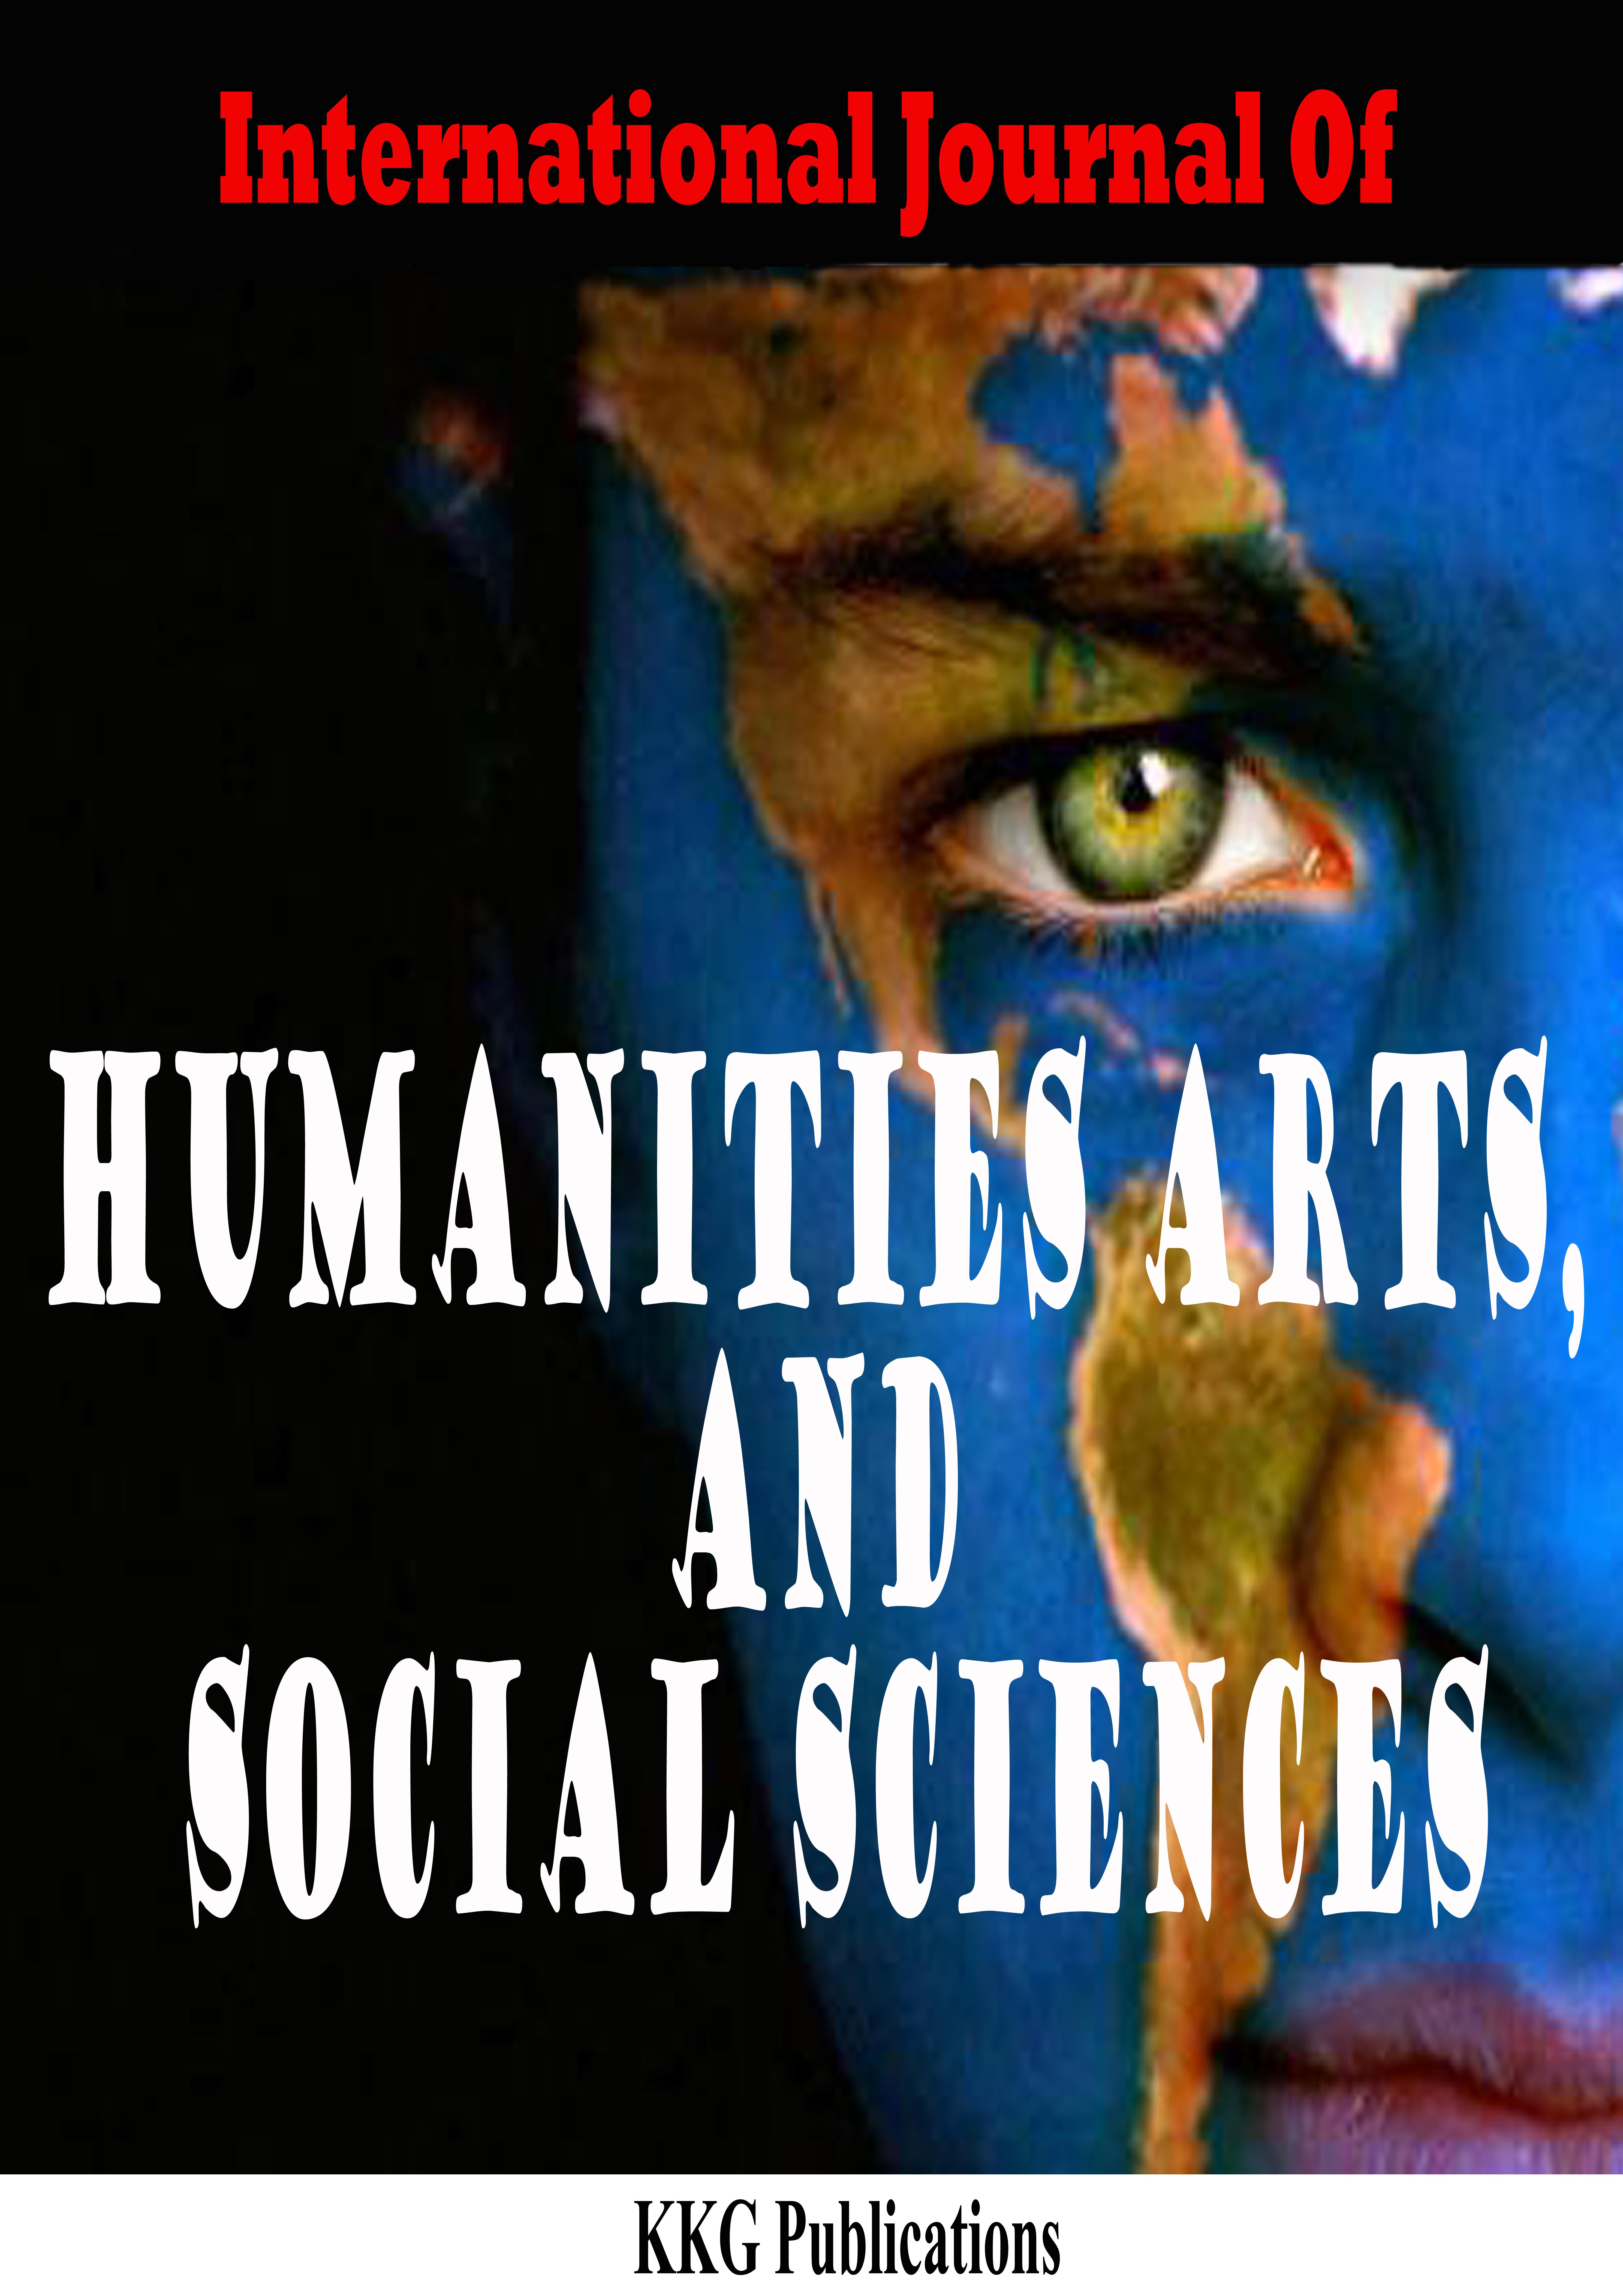 Dissertation abstracts international abbreviation